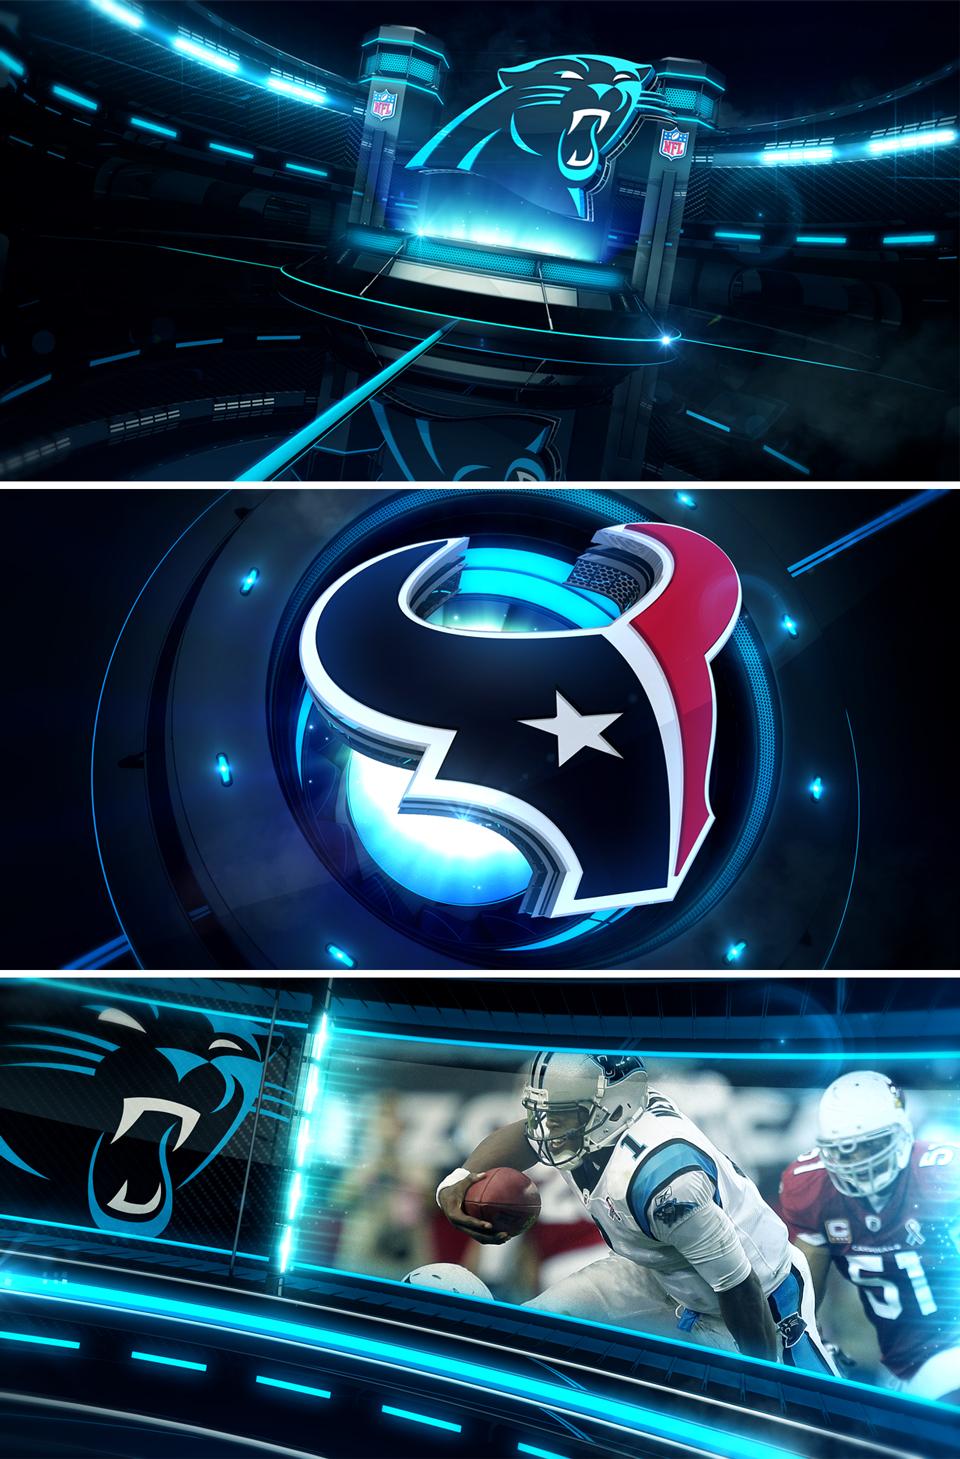 Panthers02.jpg